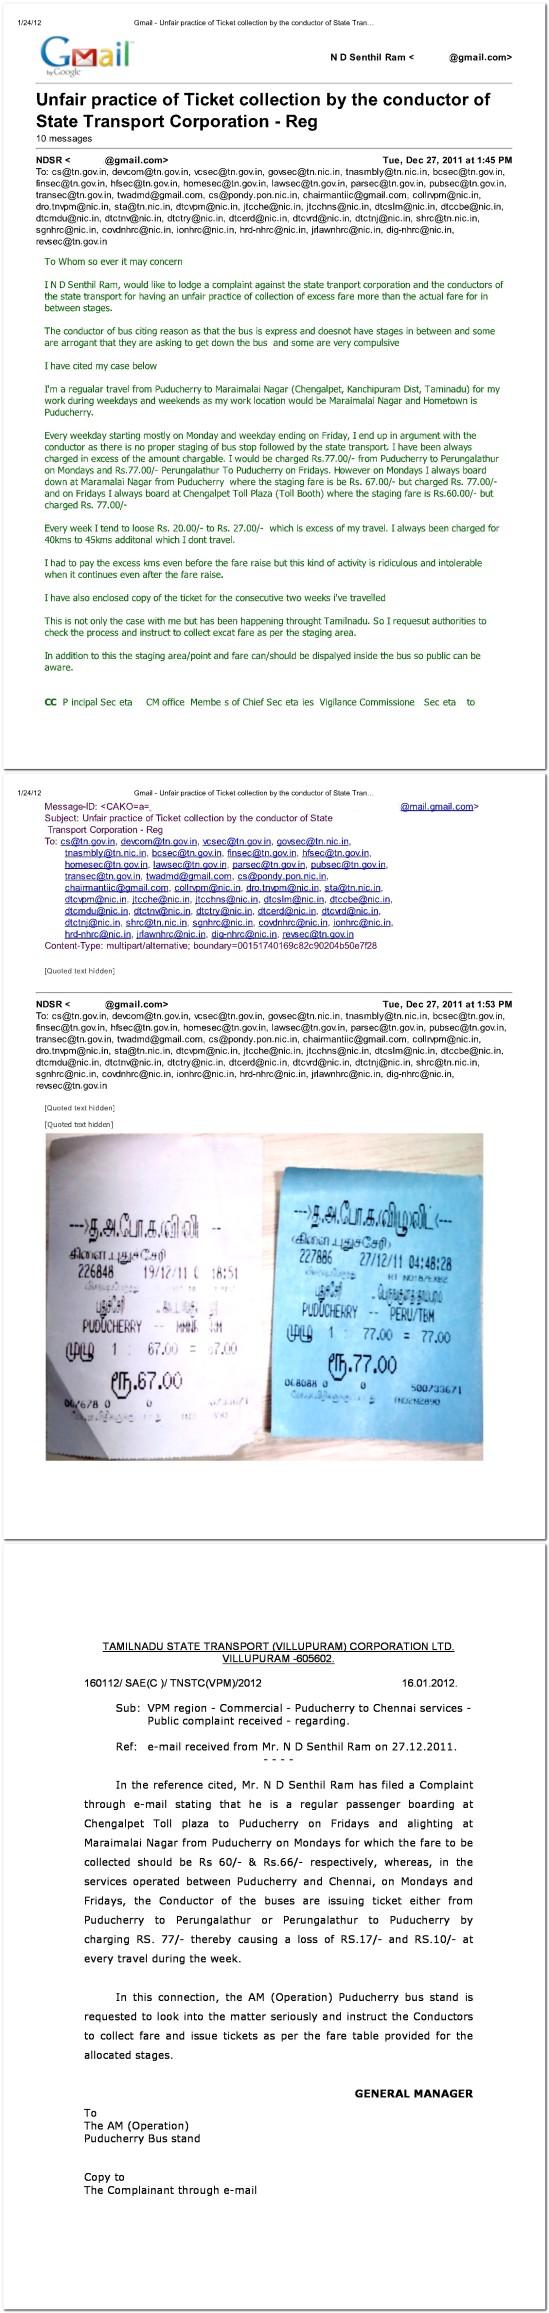 DAXSLY - Excessive Fare in  Tamilnadu state Transport